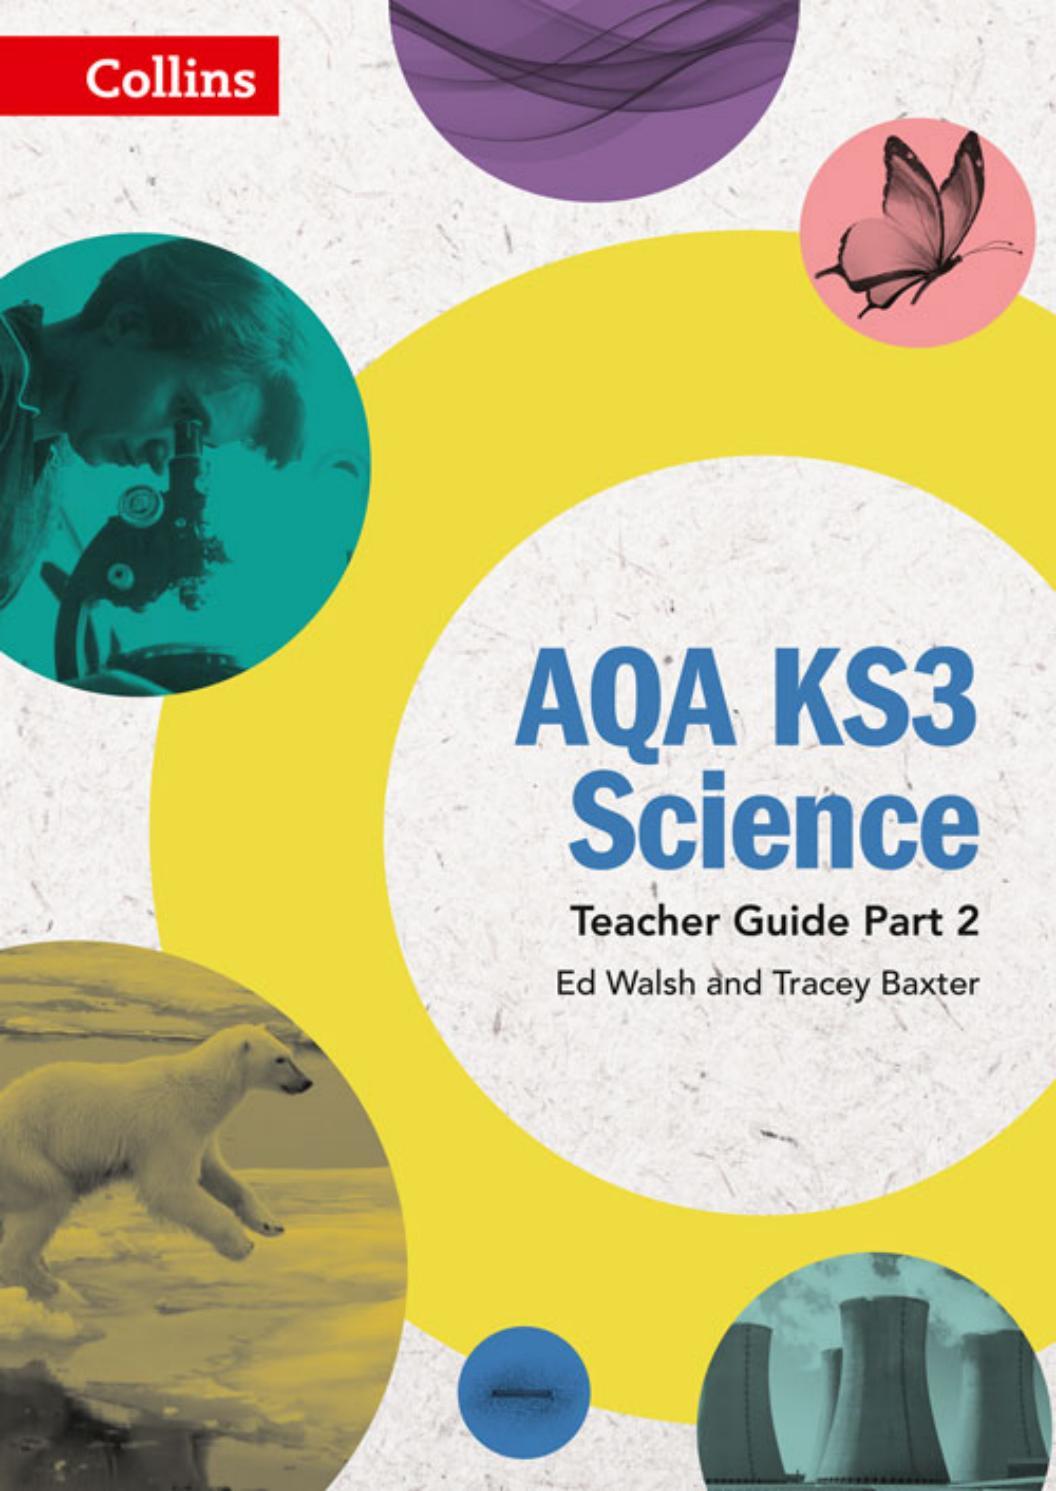 aqa ks3 science teacher guide 2 look inside by collins issuu. Black Bedroom Furniture Sets. Home Design Ideas